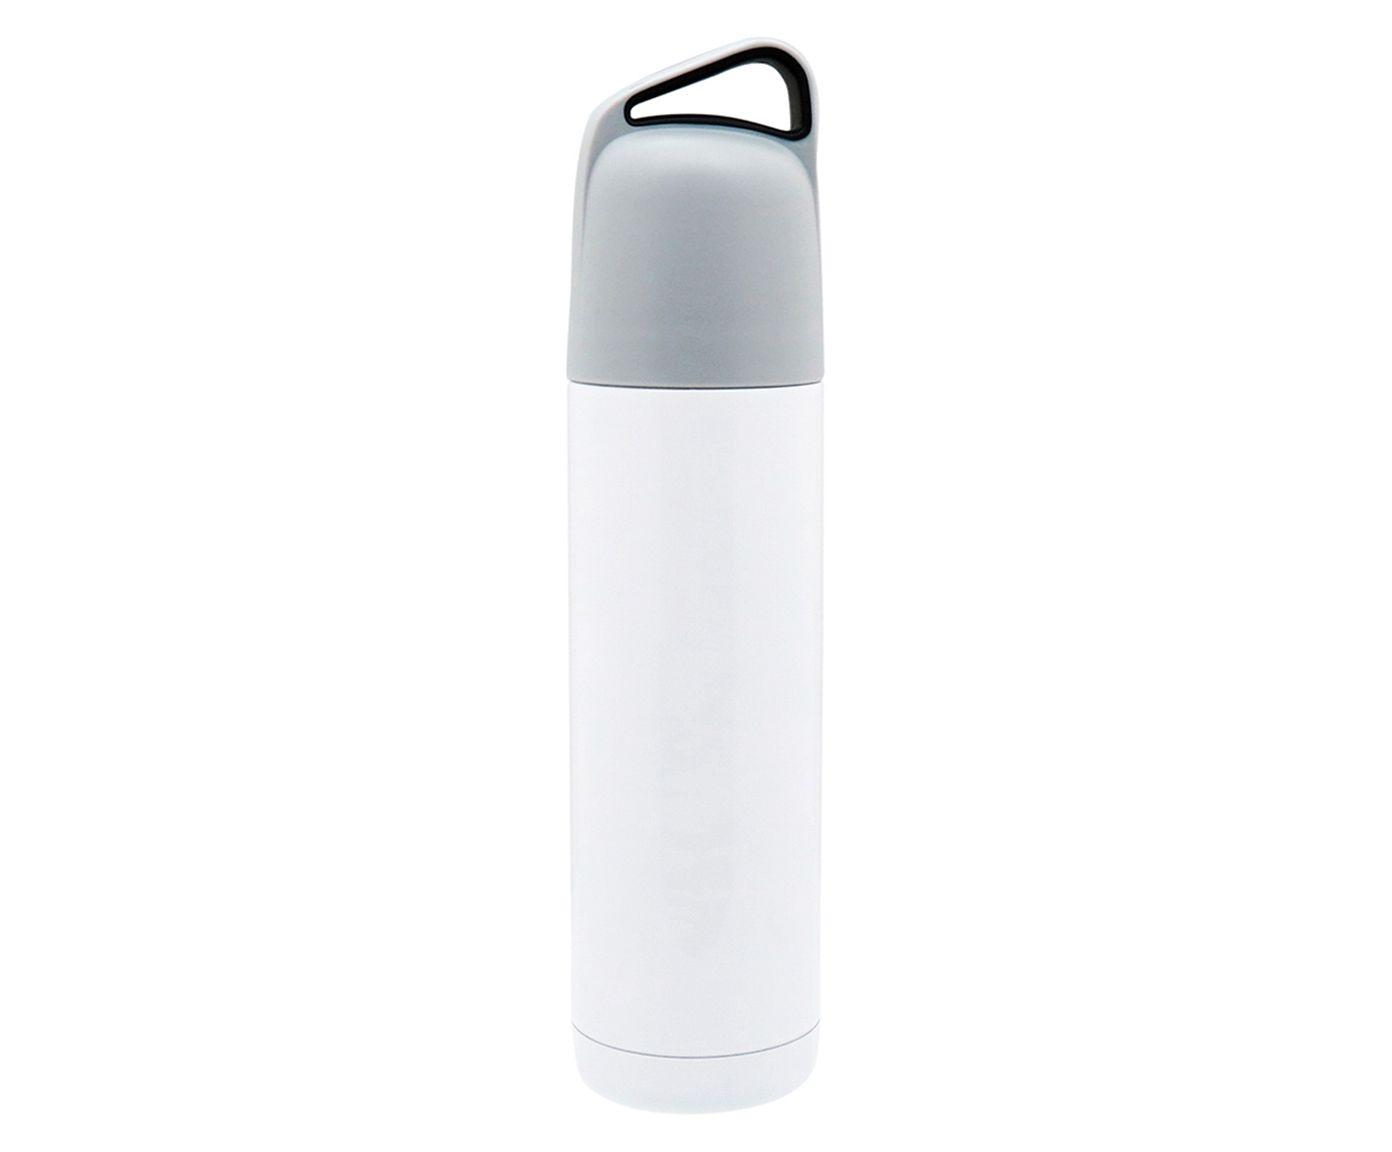 Garrafa Térmica em Inox Erre Branca - 500ml   Westwing.com.br